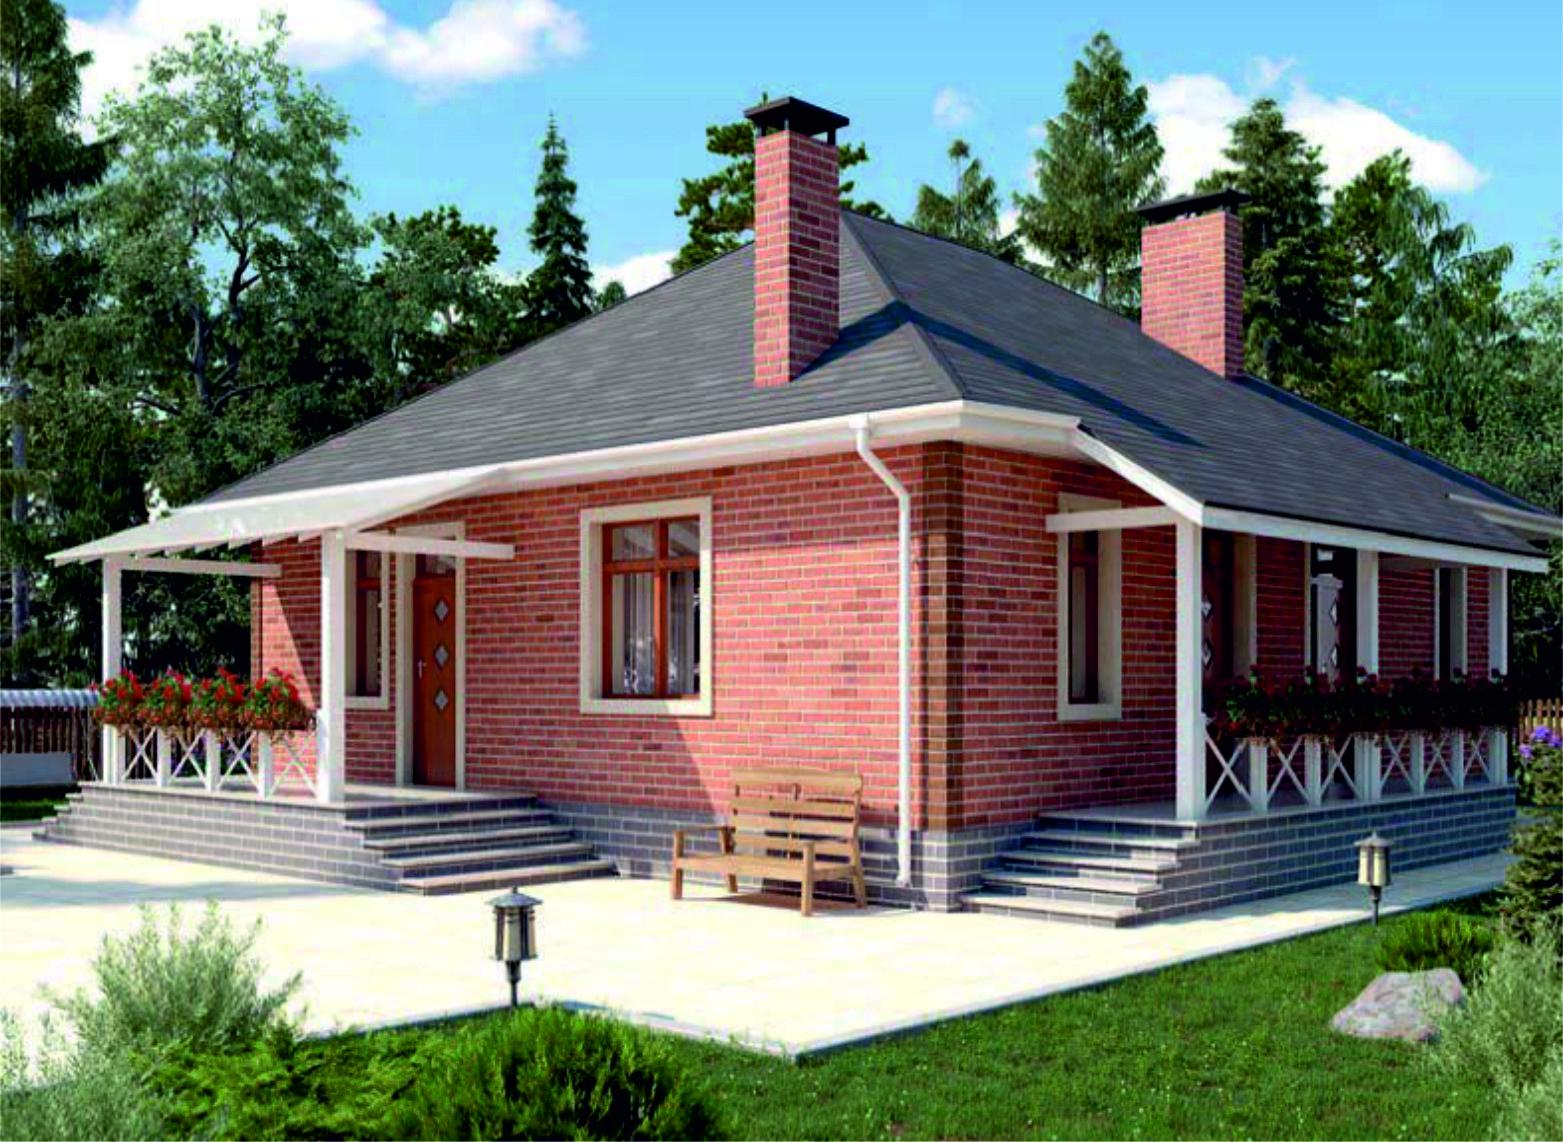 проект дома из газобетона JB 1-538 строительство под ключ за 35000р./м2 <br>итого 3 261 900 рублей